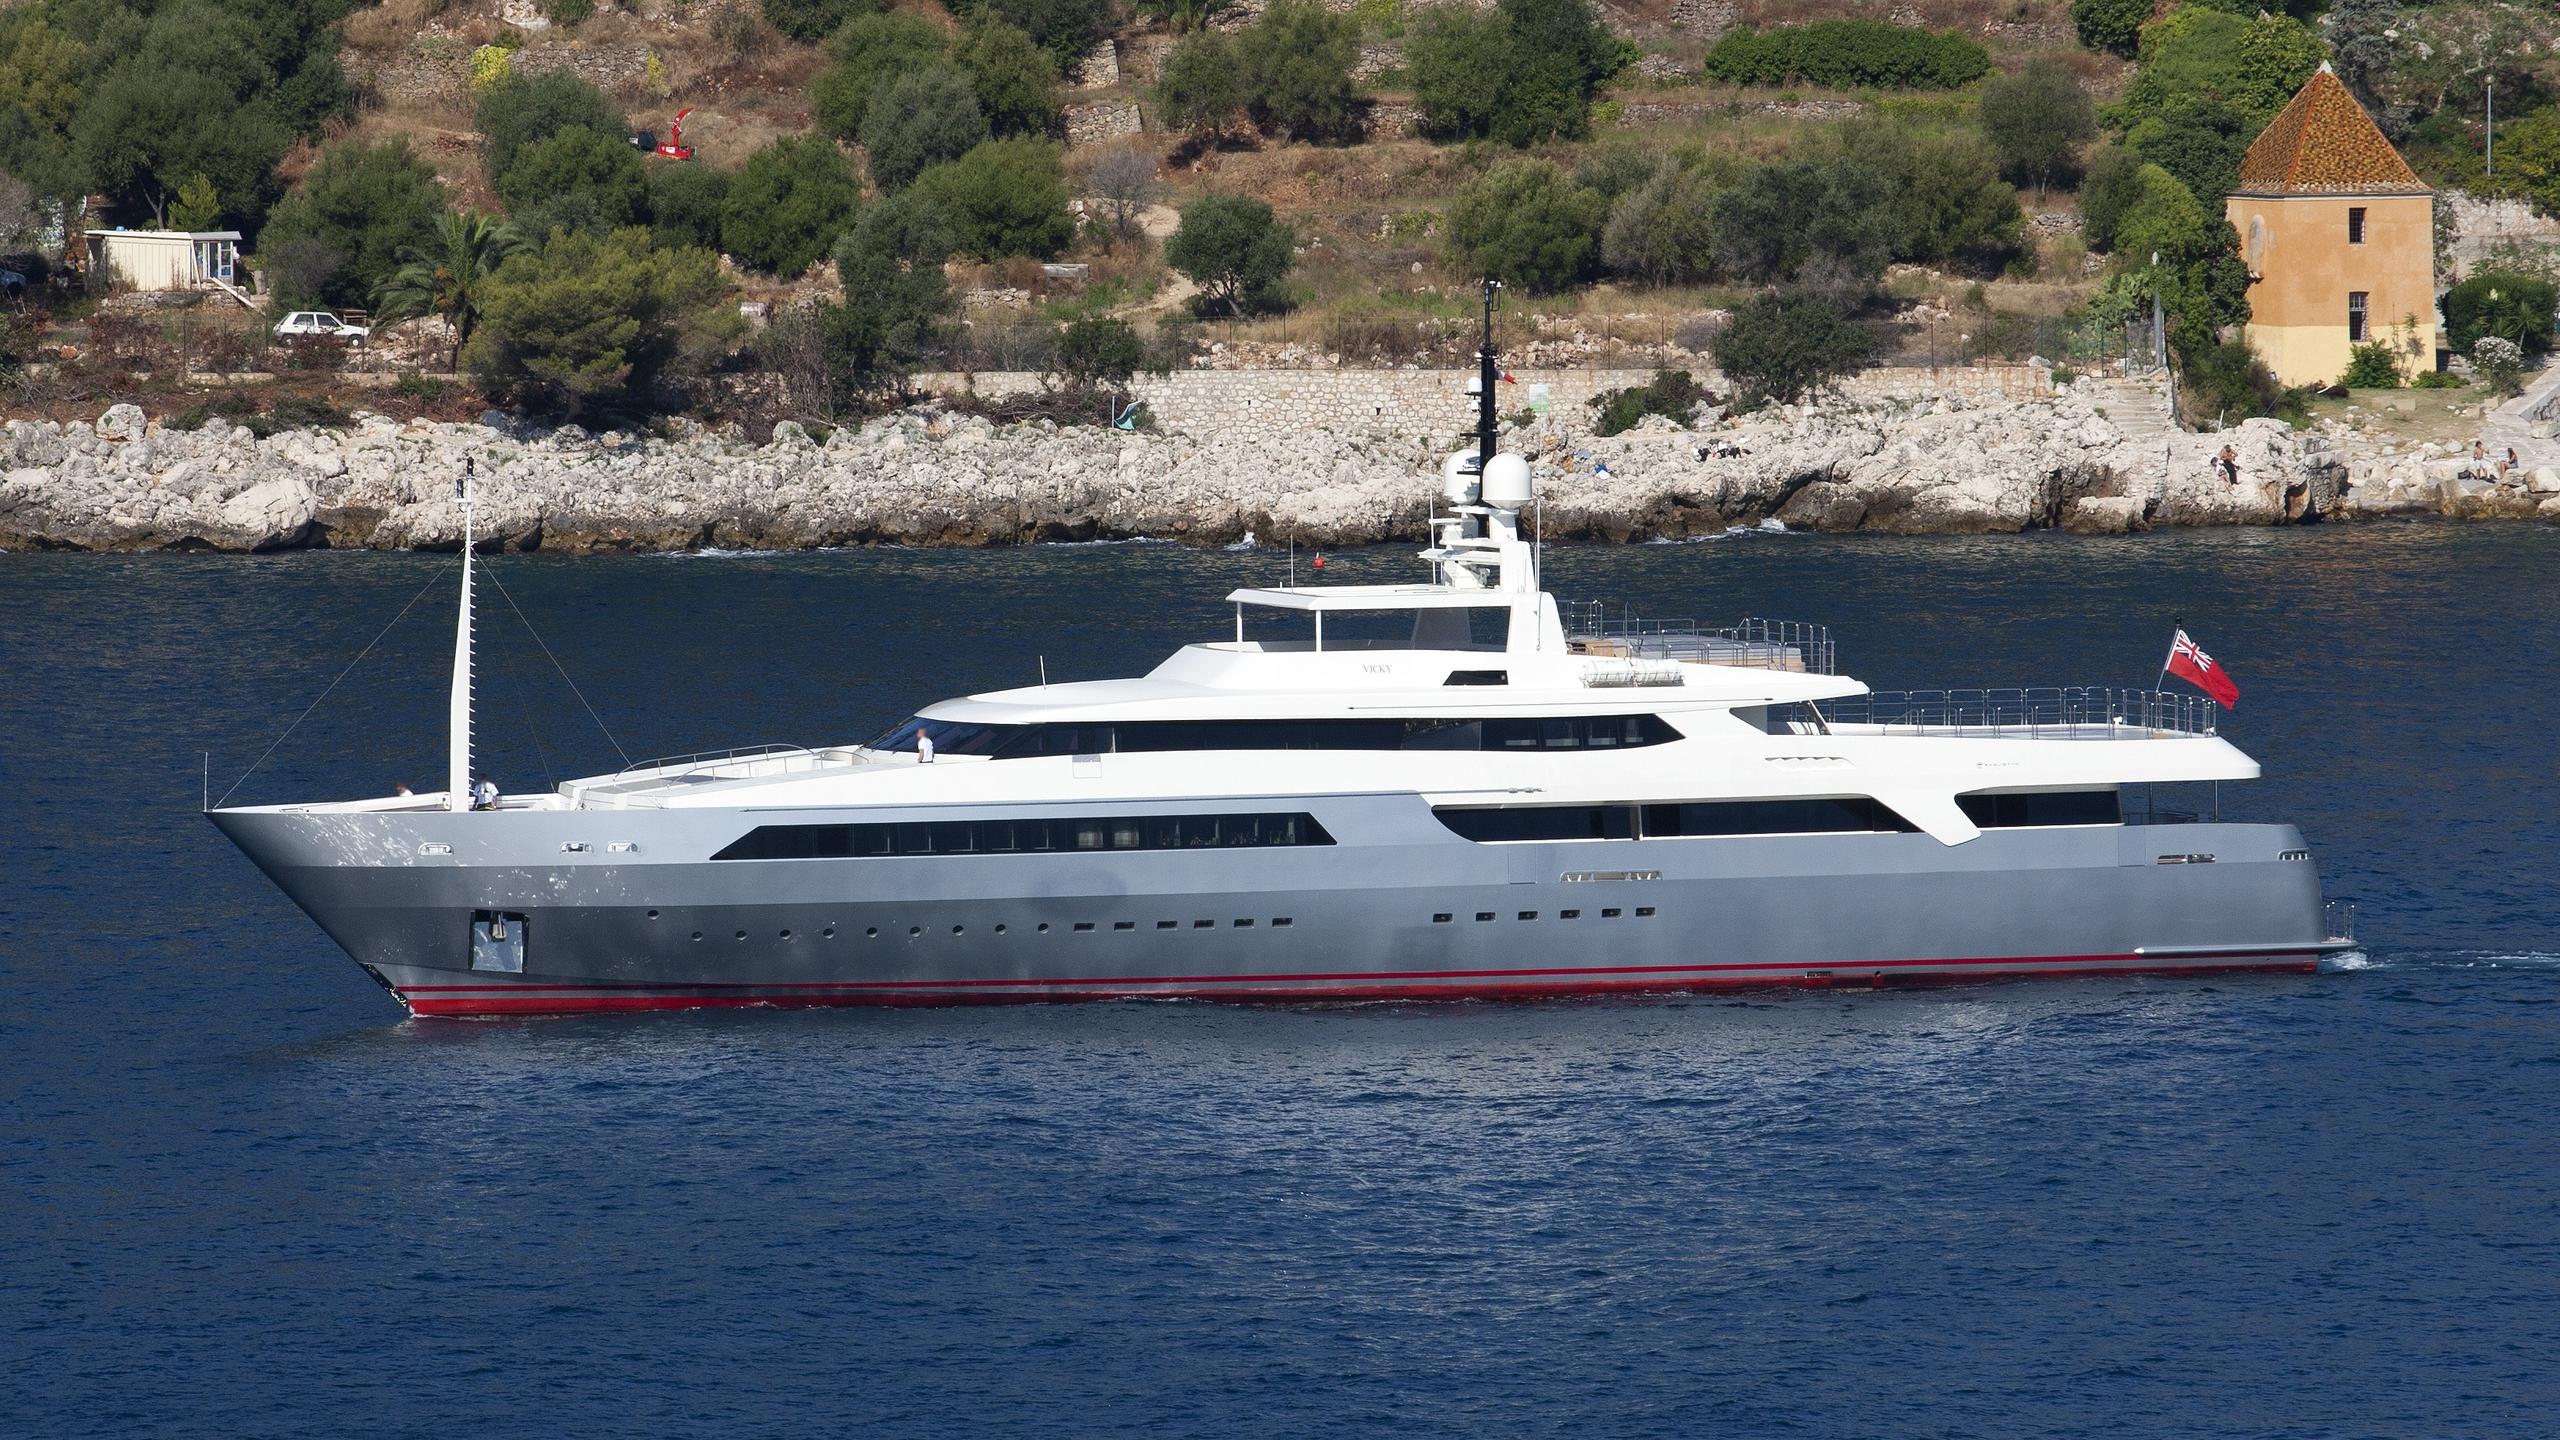 vicky-motor-yacht-baglietto-2008-59m-half-profile